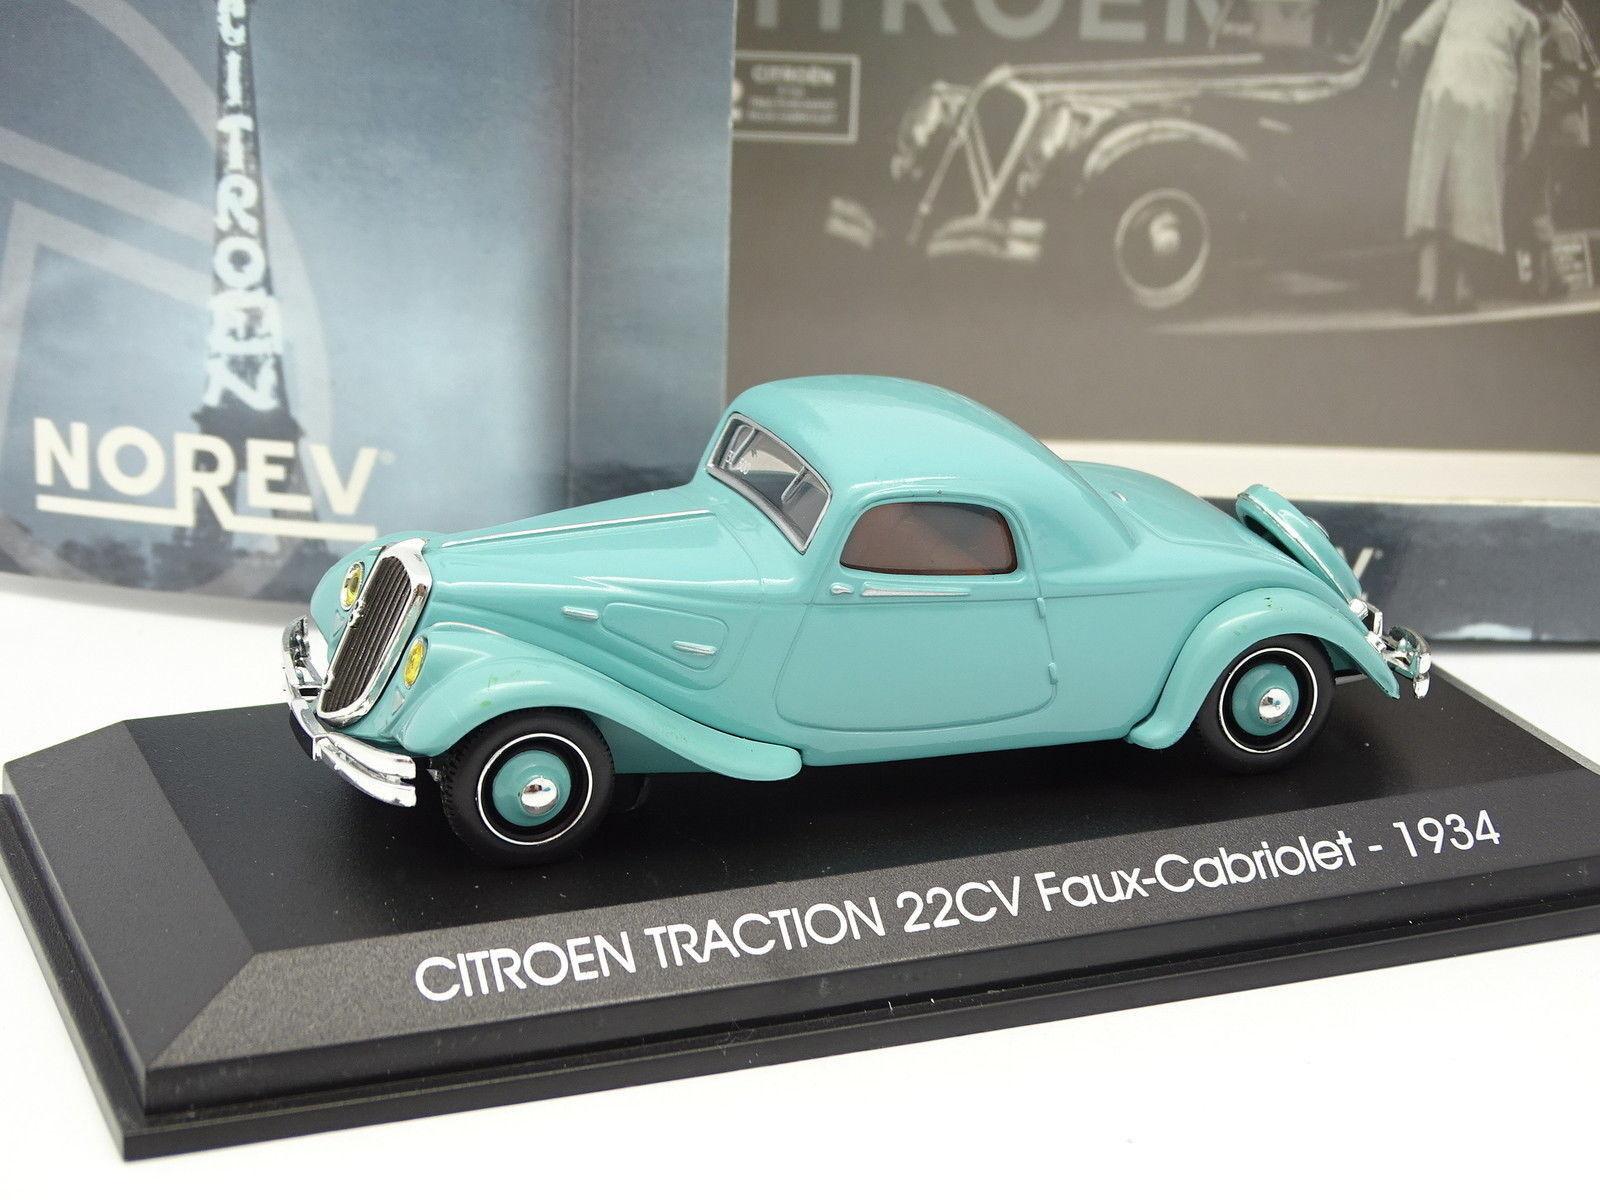 Norev 1 43 - Citroen Traction 22CV Falso Cabriolet 1934 1934 1934 blue d506a1